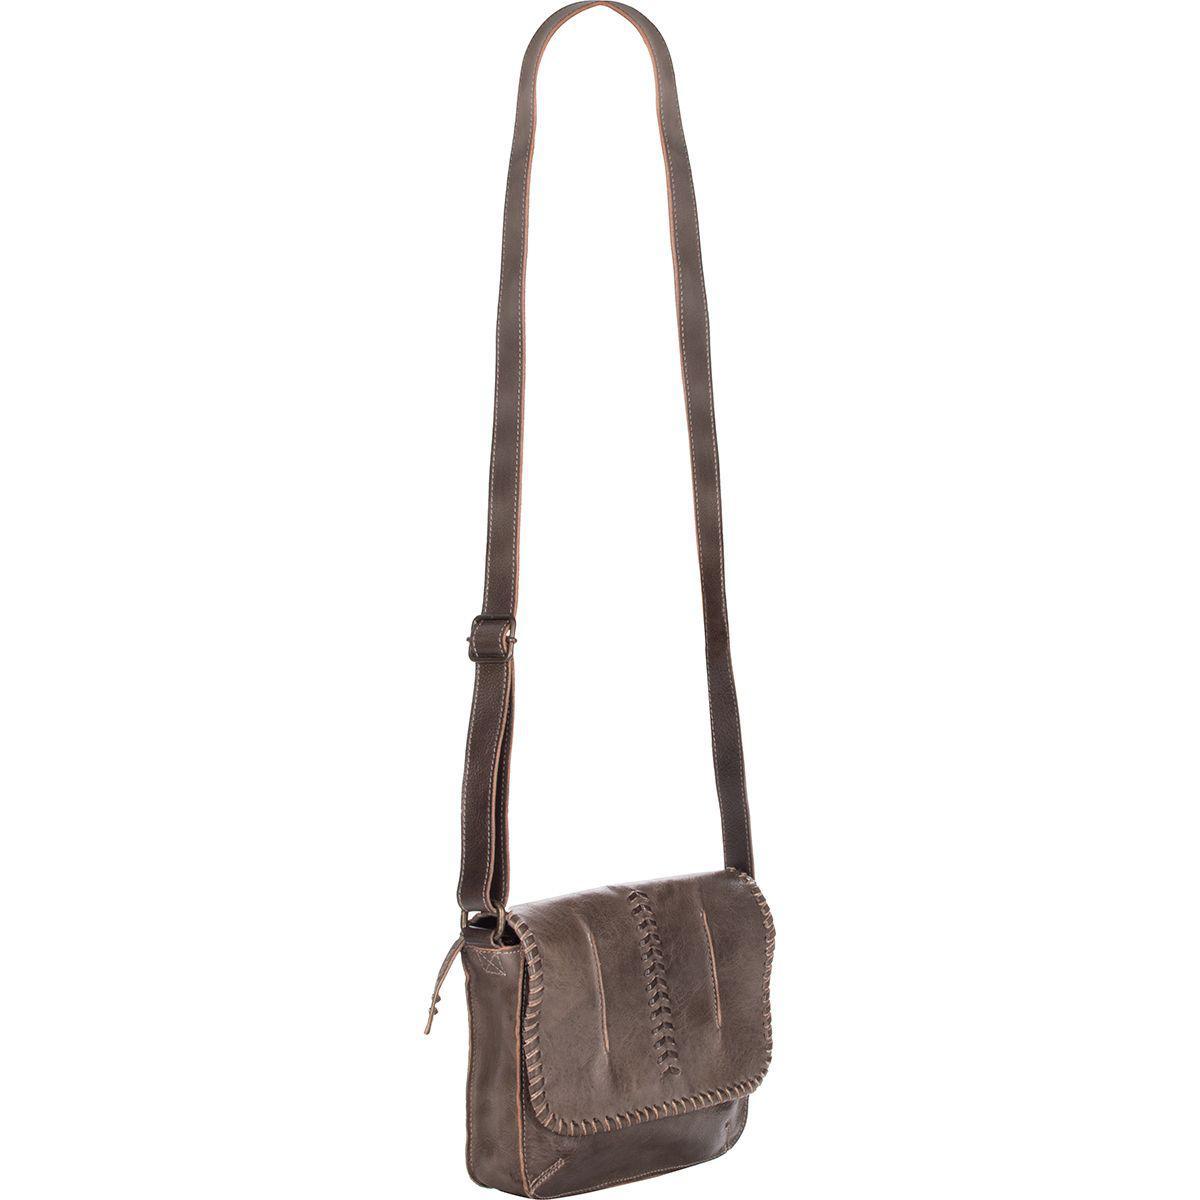 Bed Stu Brown Frankie Leather Crossbody Bag Lyst